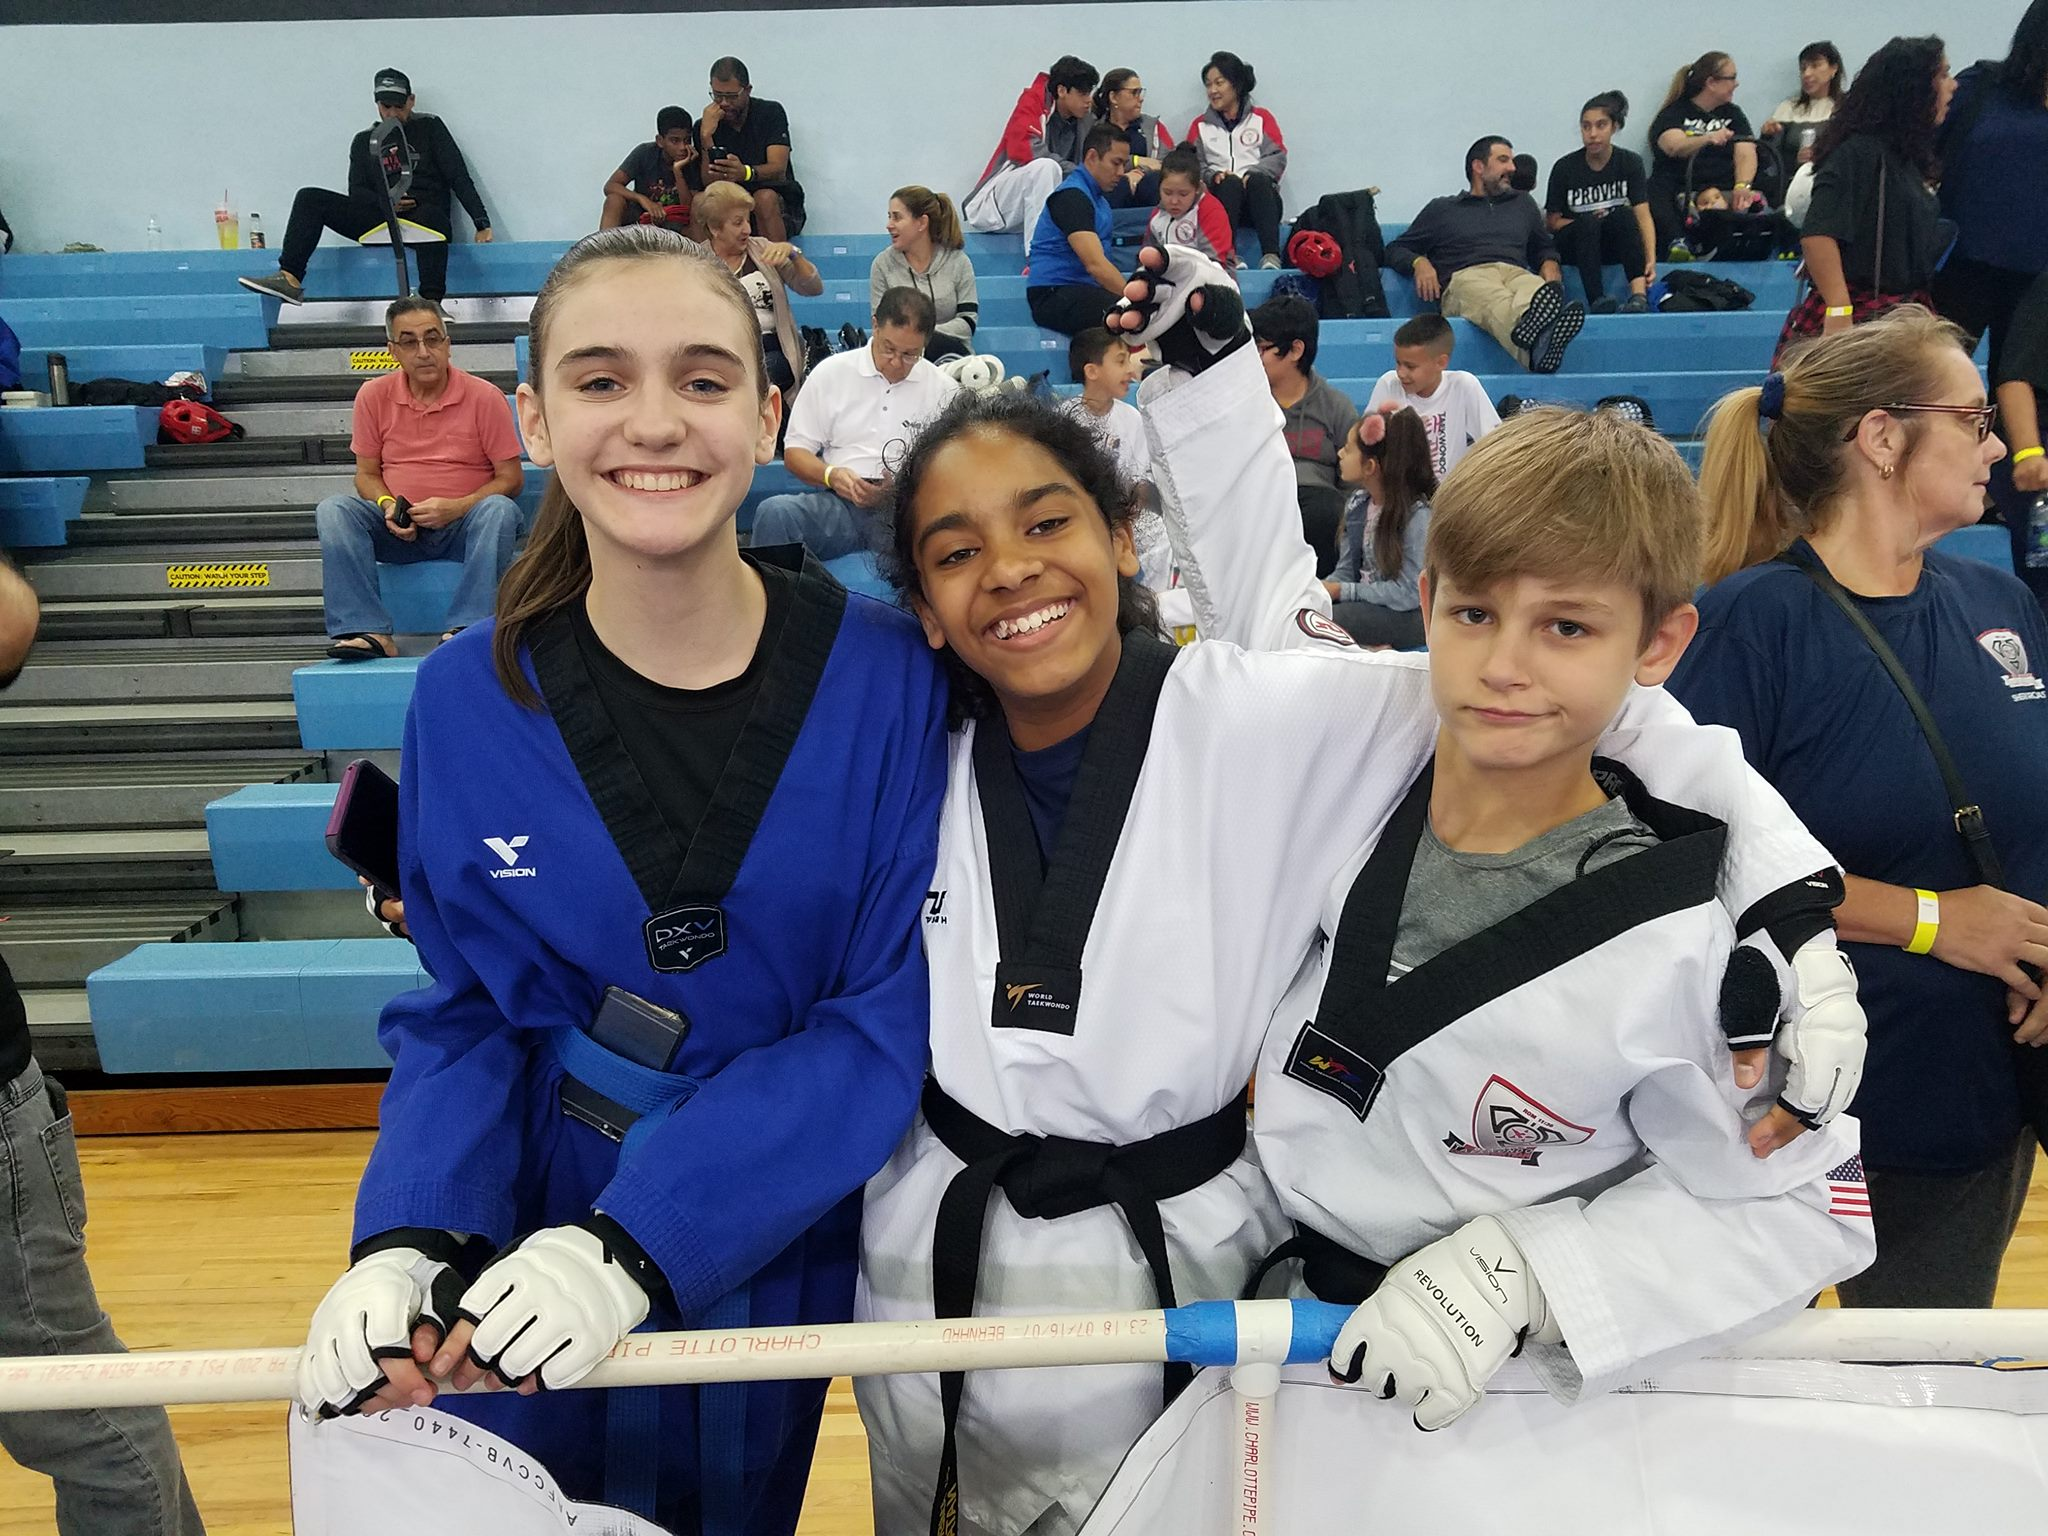 81756b8503d62 Olympic TaeKwonDo Training - G3America Martial Arts